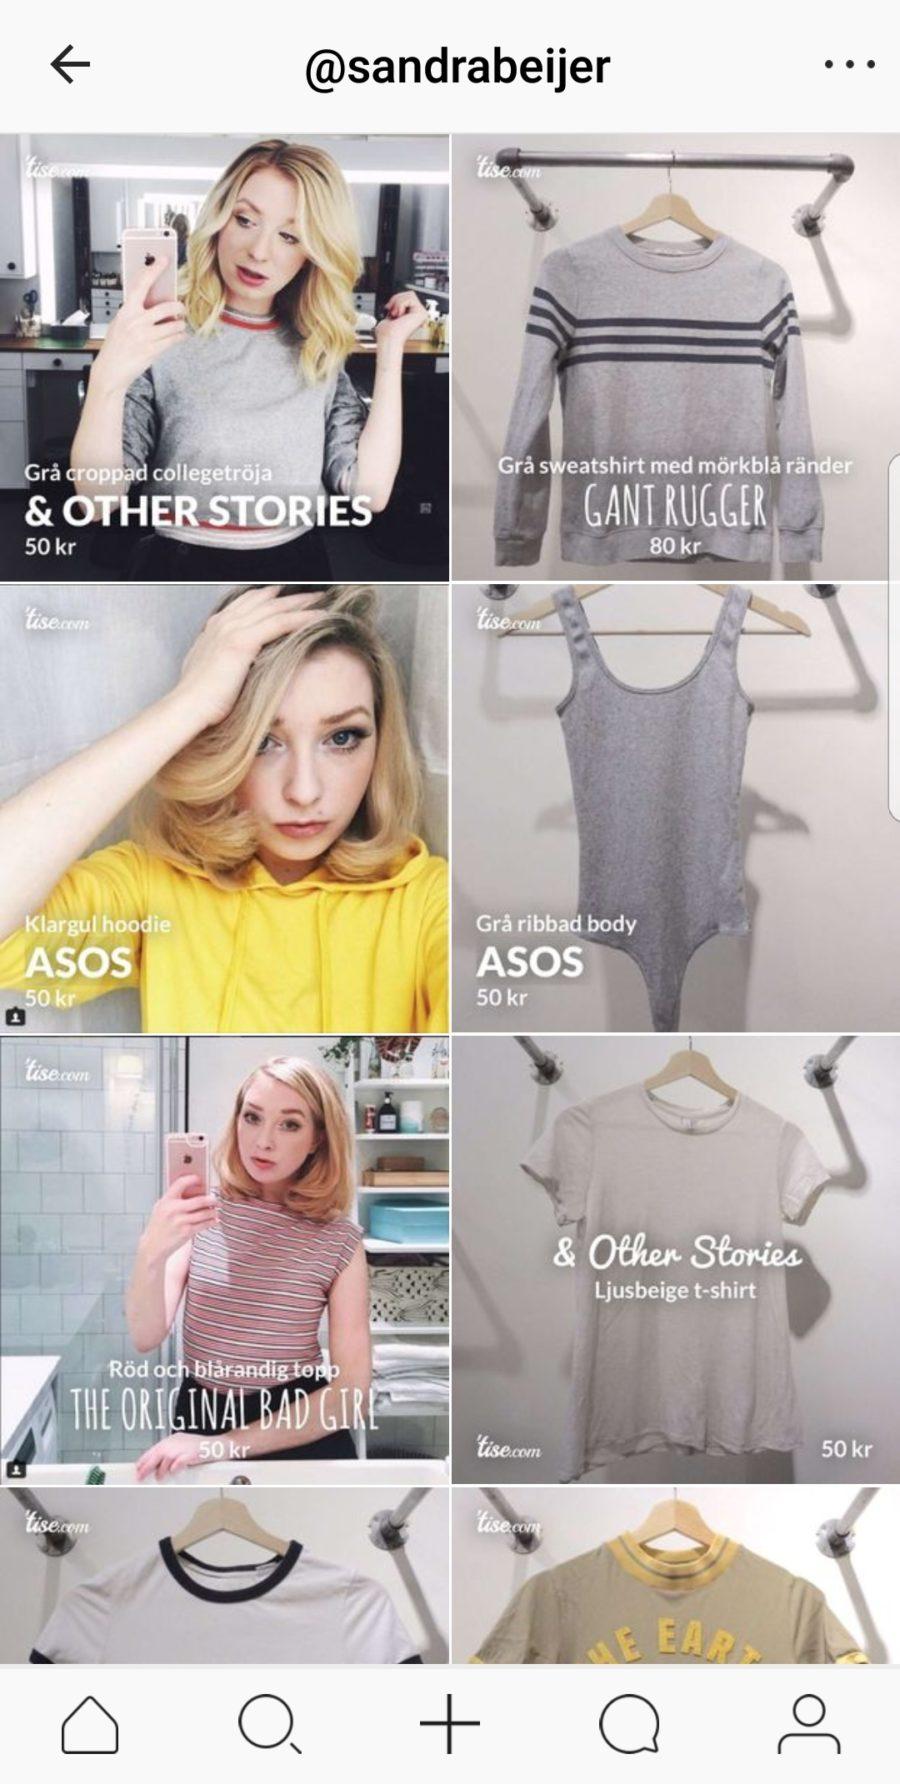 9ffc35dc bloppis online – köp min garderob | Sandra Beijer